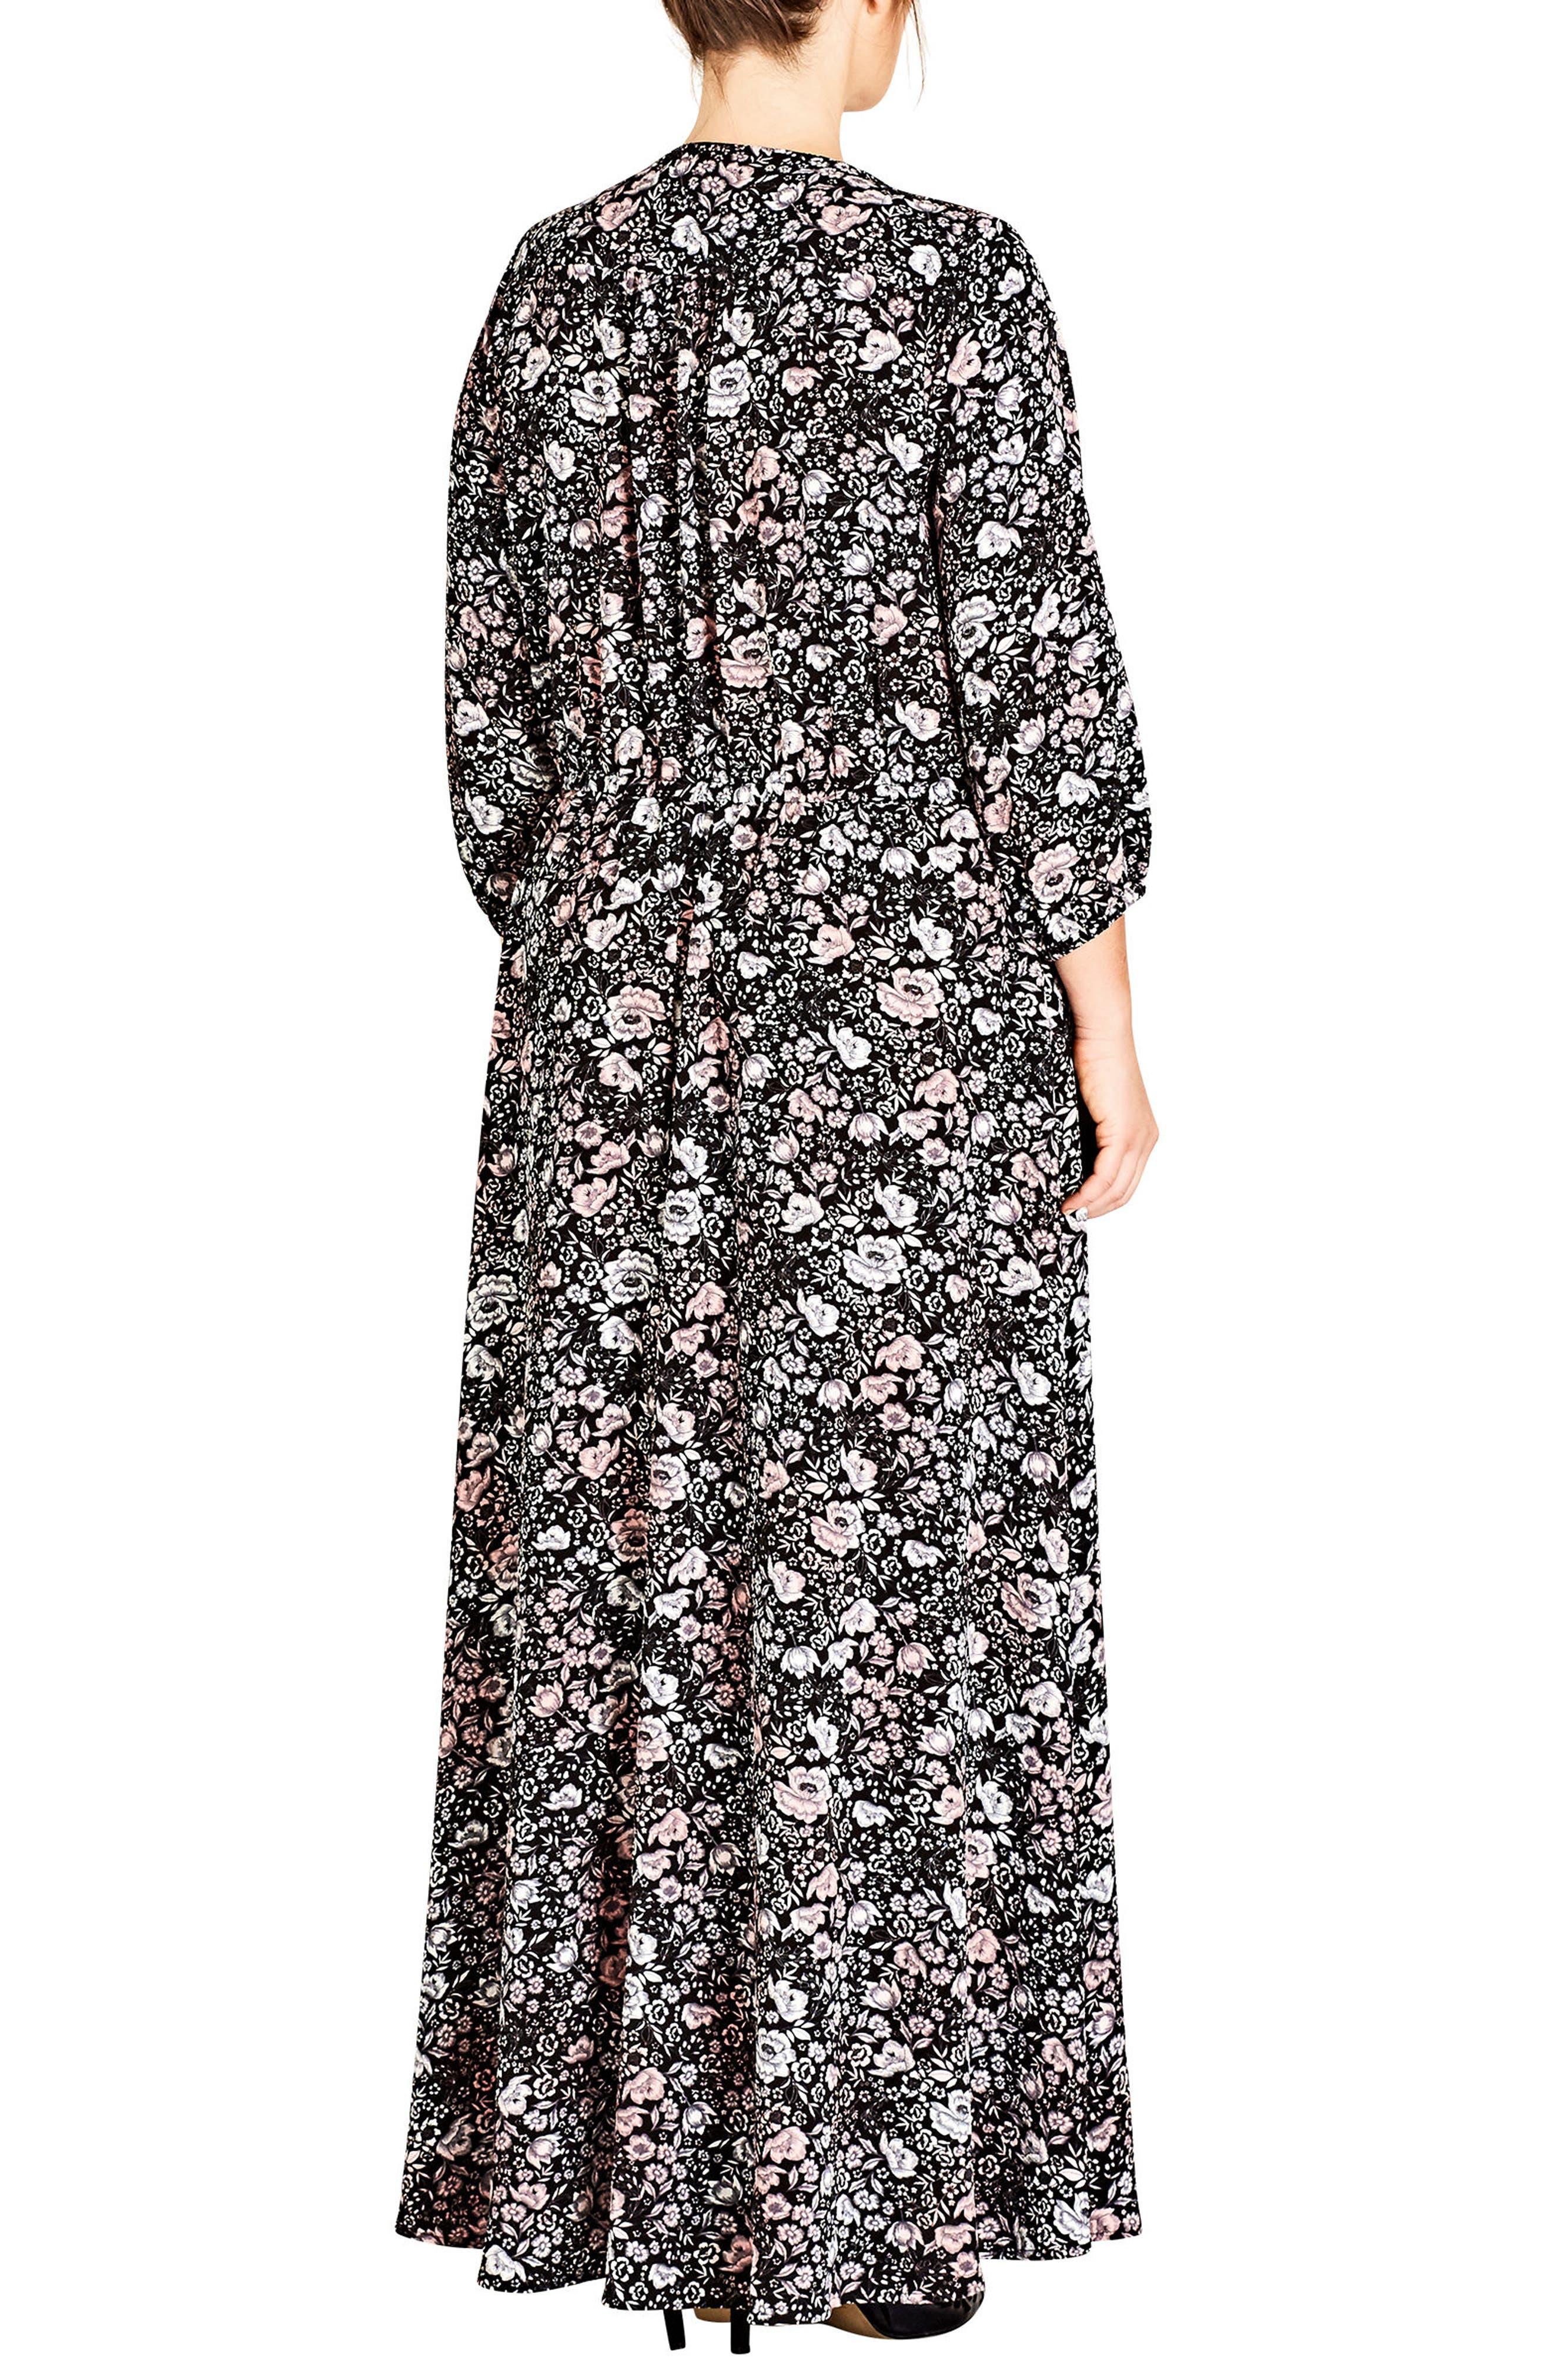 Etched Floral Maxi Dress,                             Alternate thumbnail 2, color,